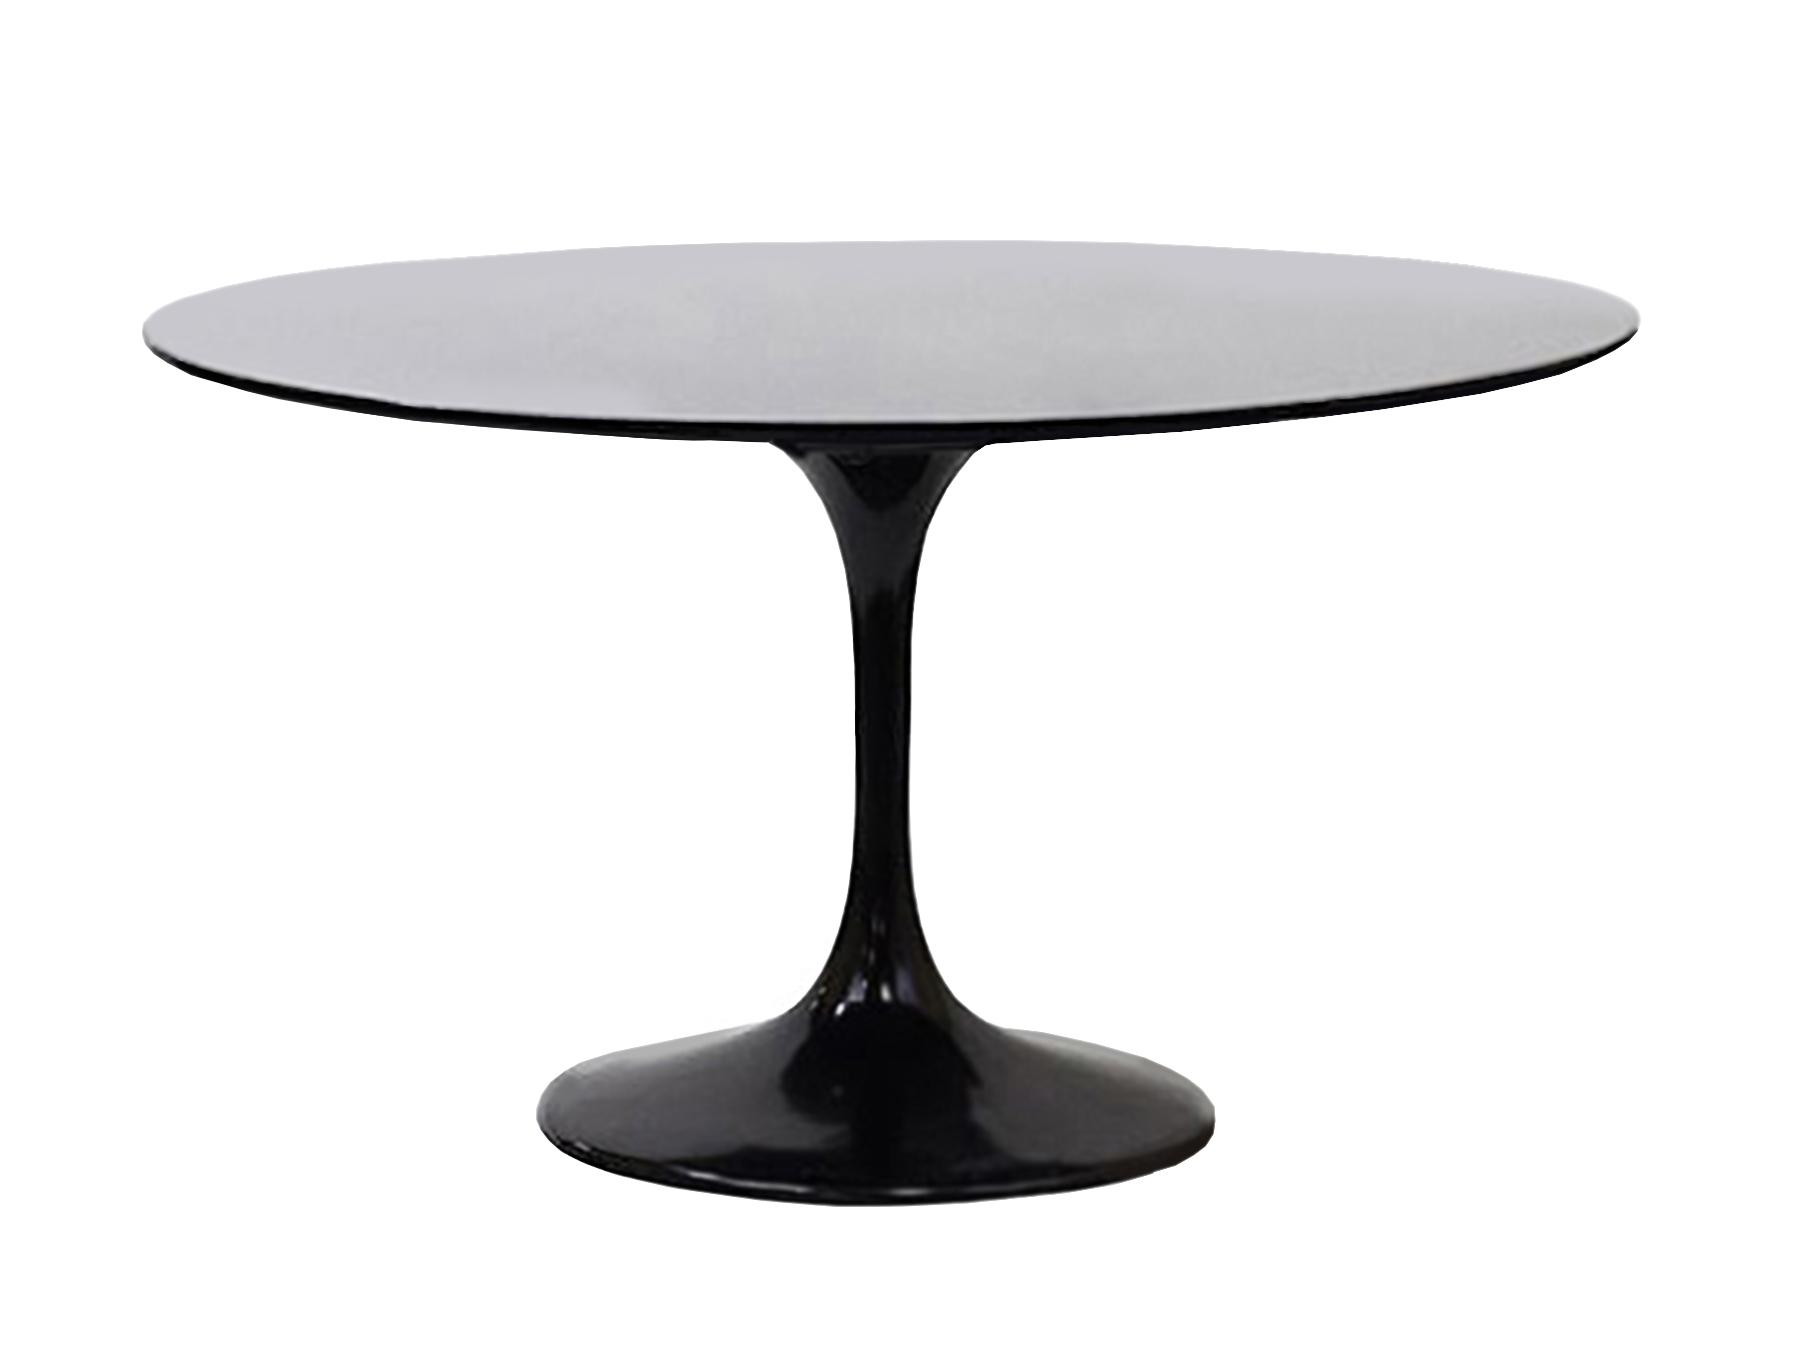 Кухонный стол ActualDesign 15443121 от thefurnish